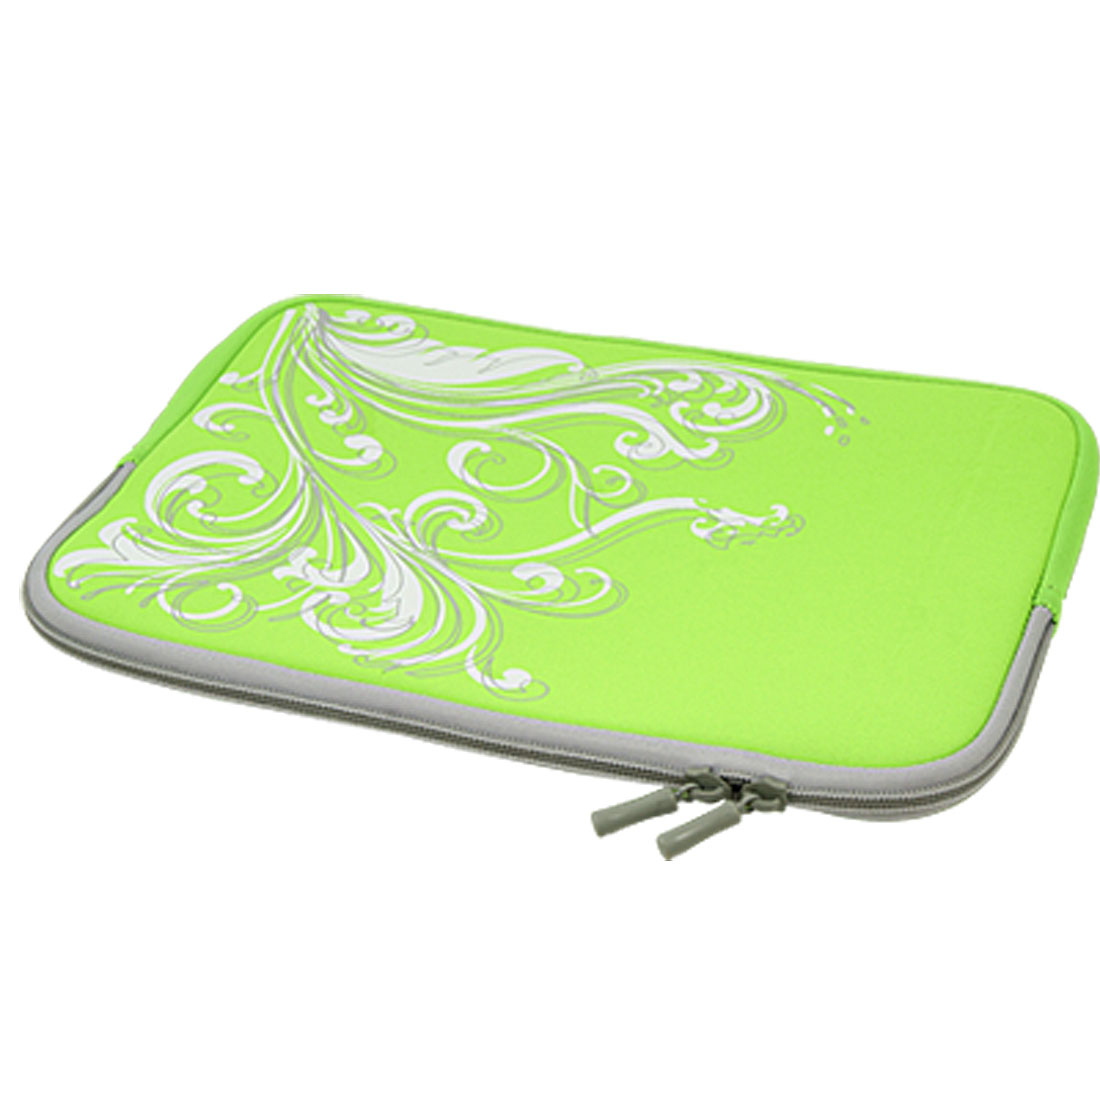 "10"" 10.1"" 10.2"" Green Swirl Neoprene Laptop Sleeve Bag Case"